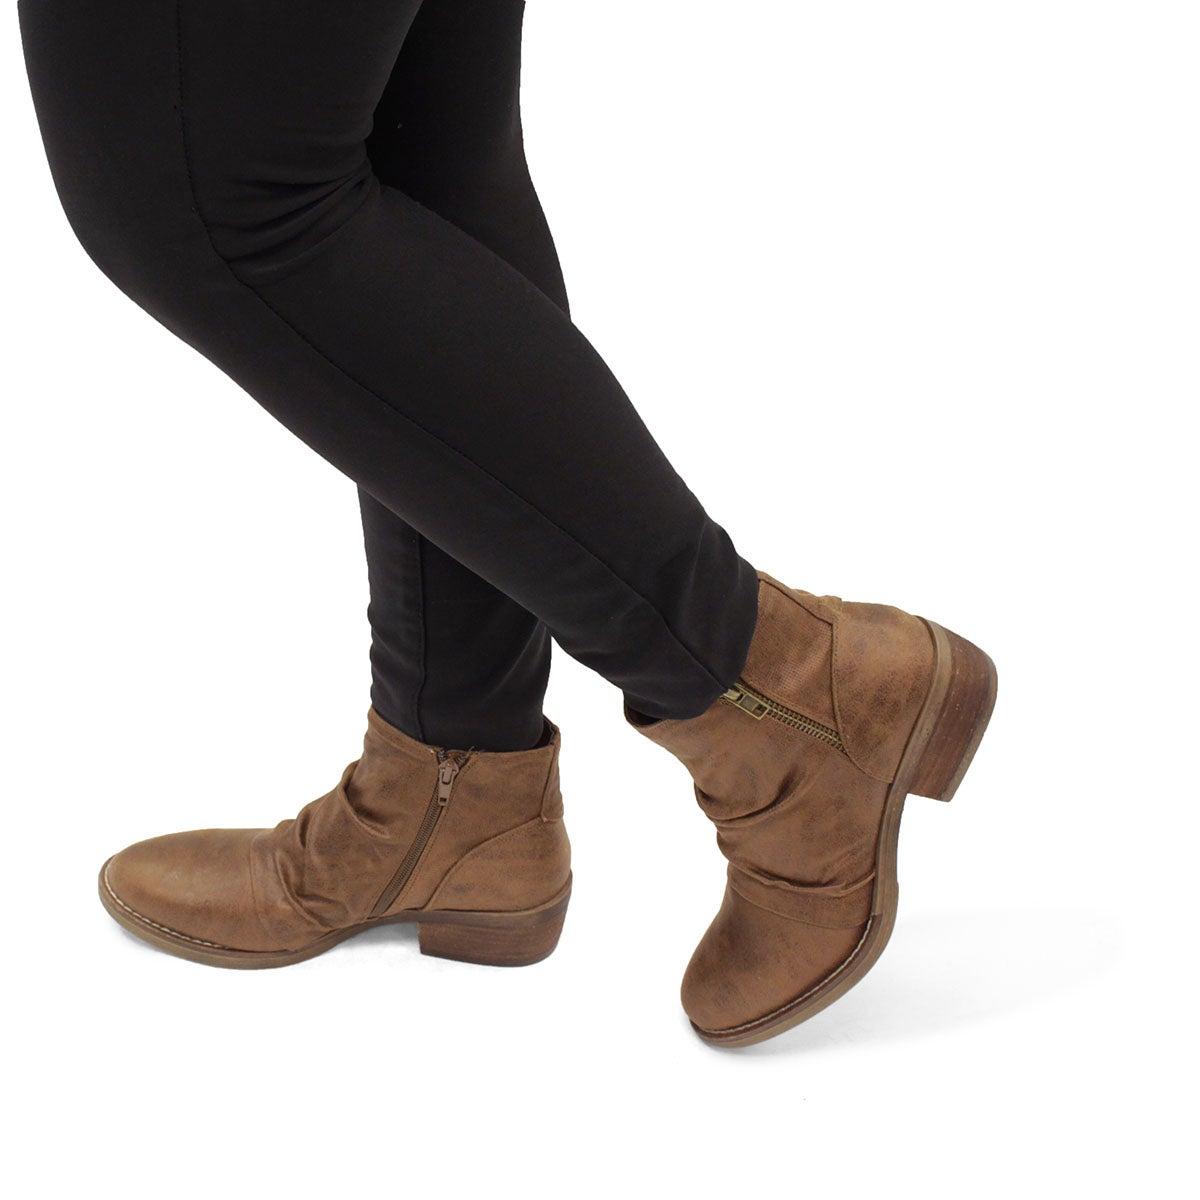 Lds Tyra tan slip on bootie